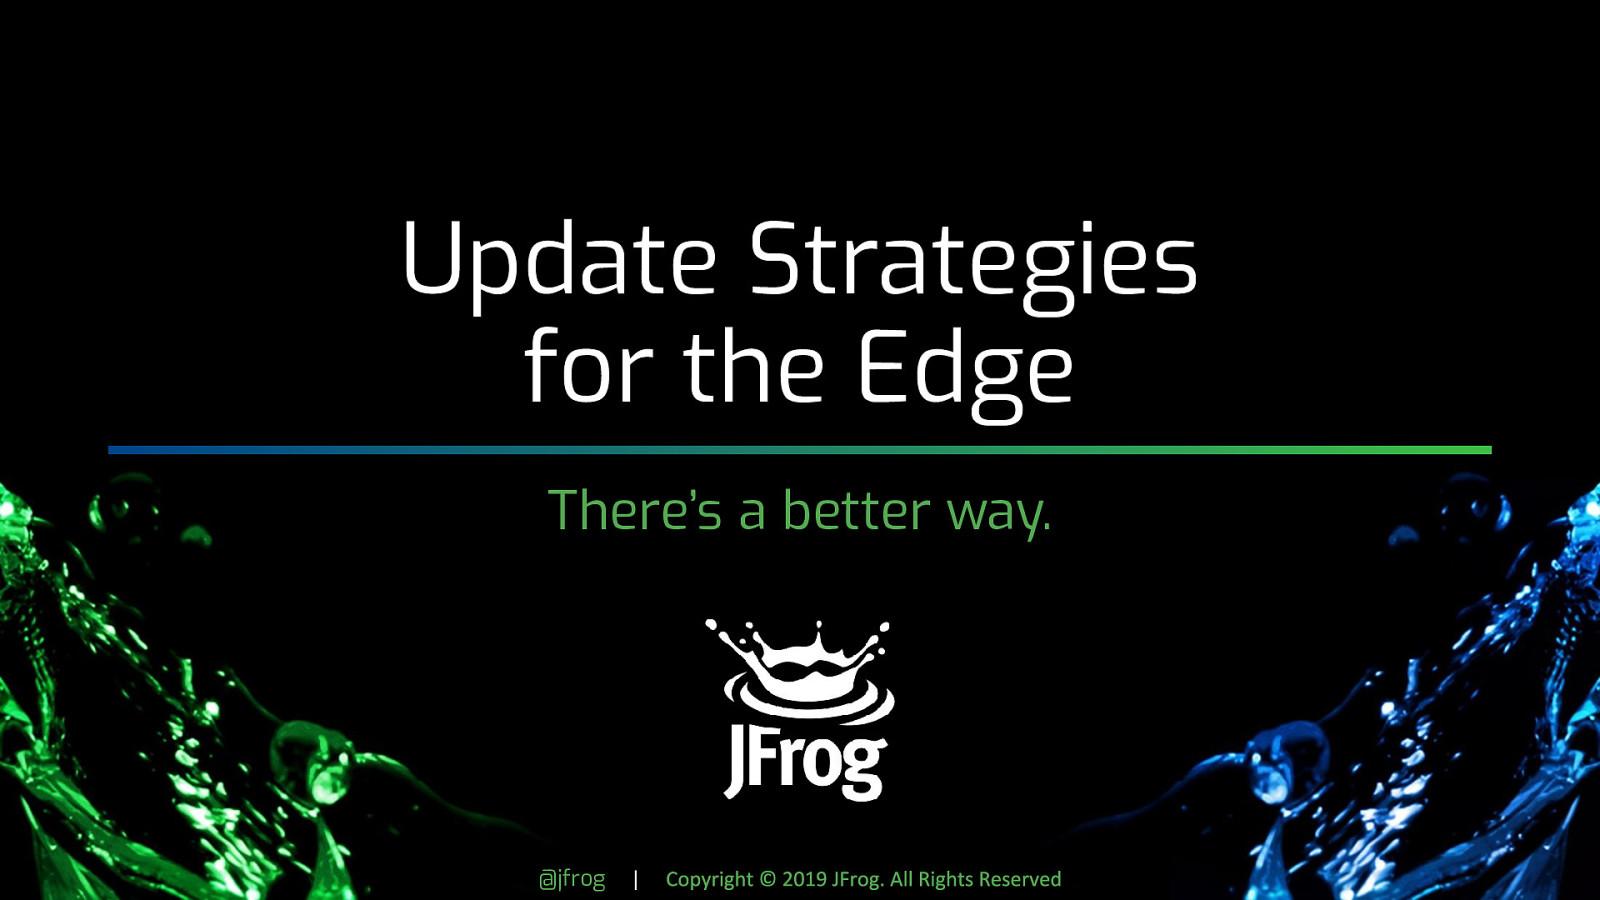 Updating the Edge